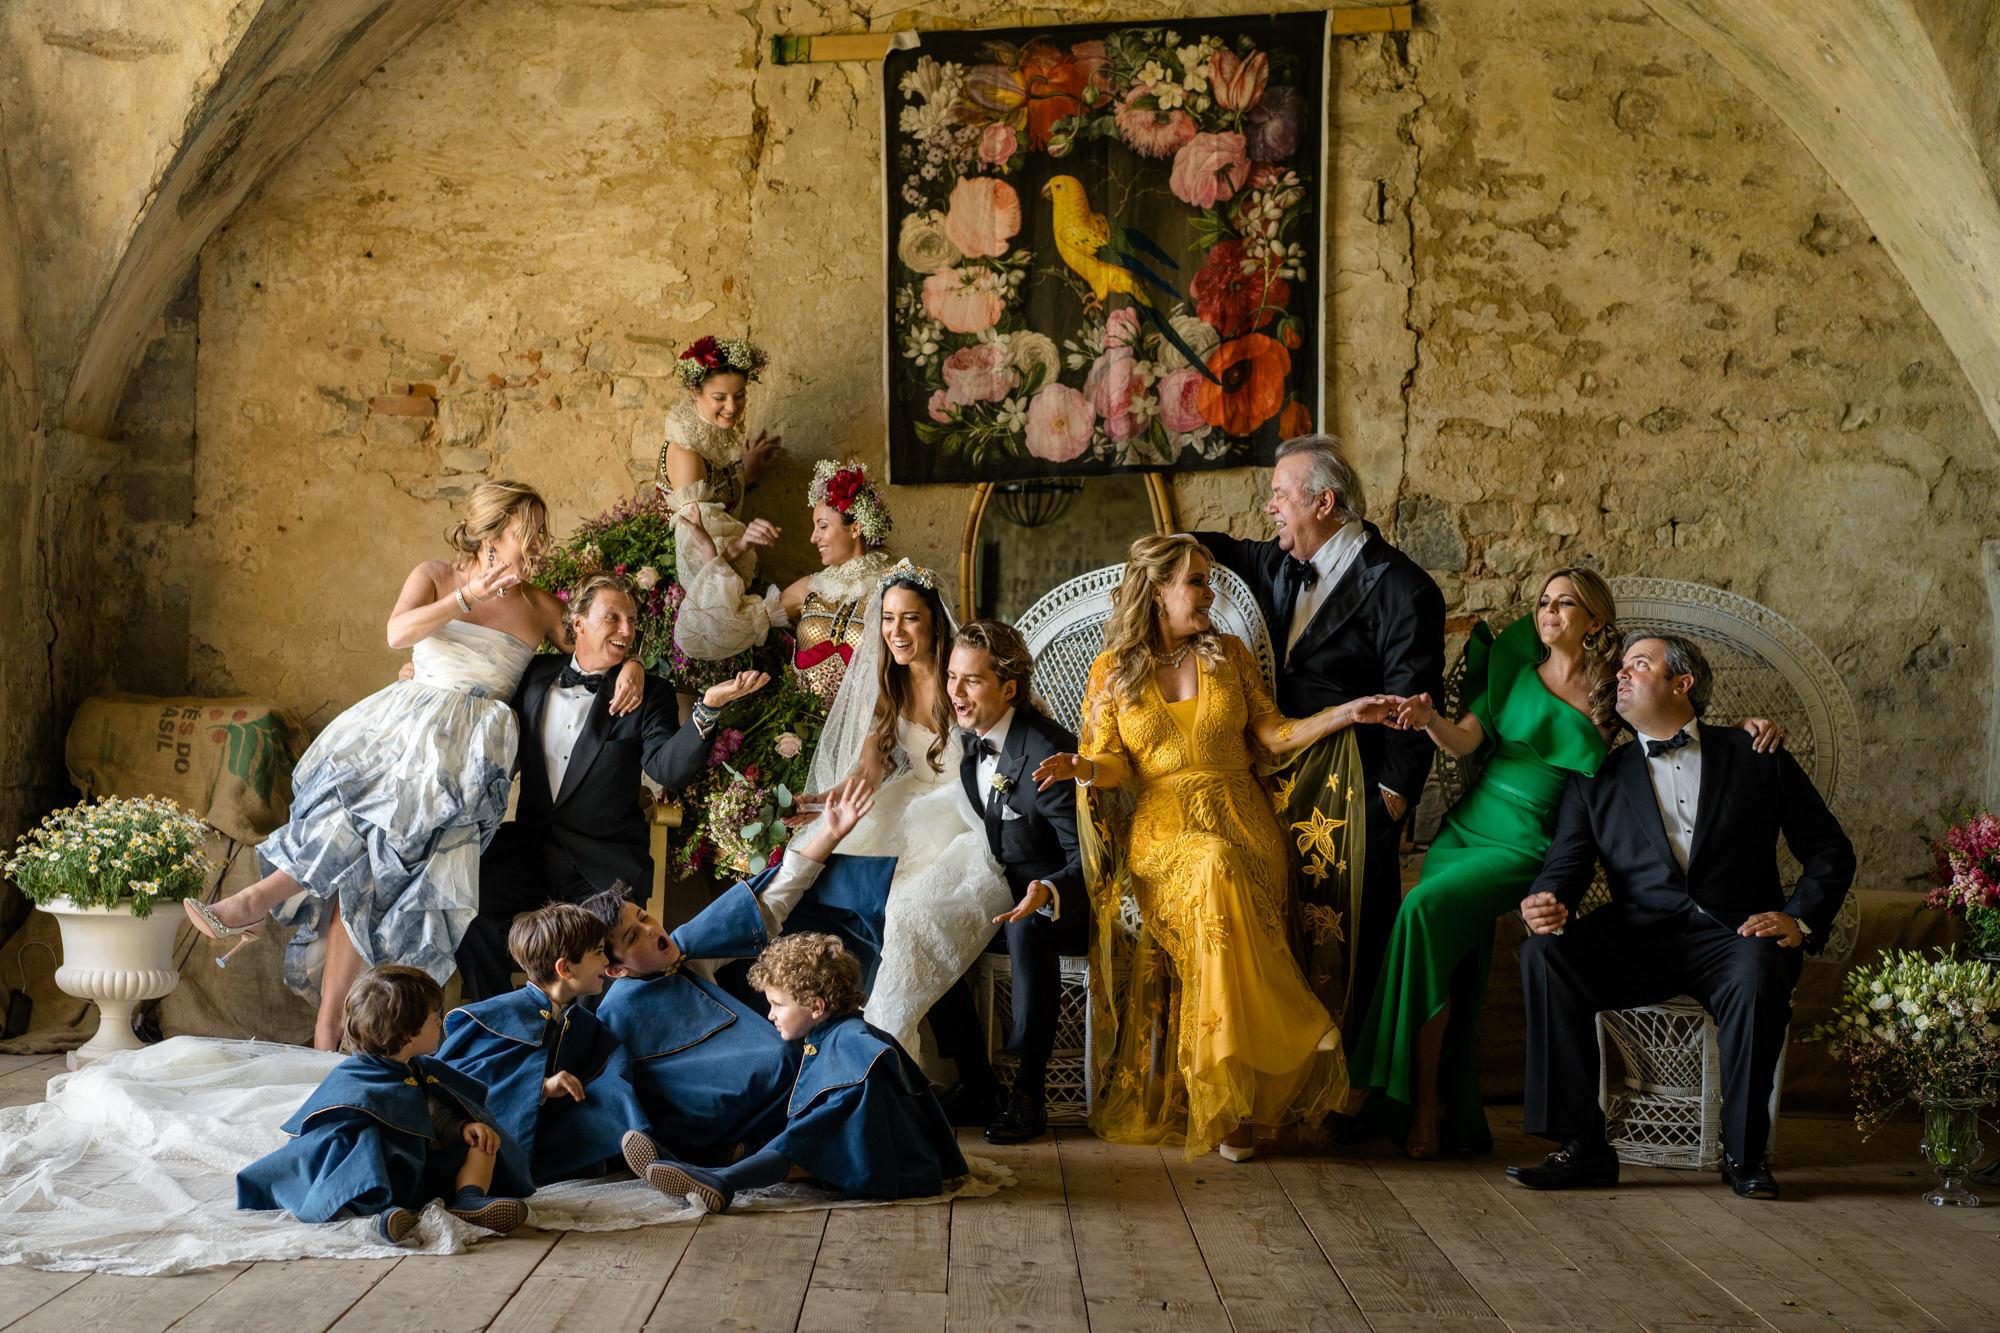 Theatre themed bridal party portrait by David Bastianoni